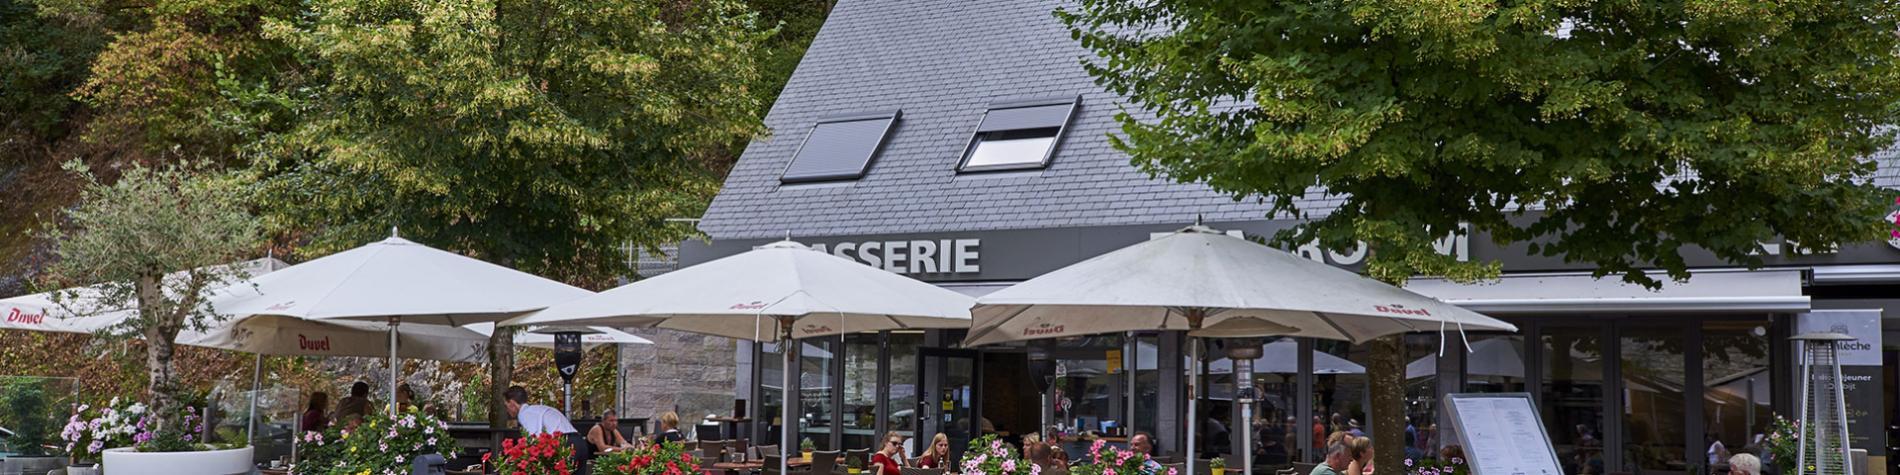 Hotel & restaurant - La Calèche - Durbuy